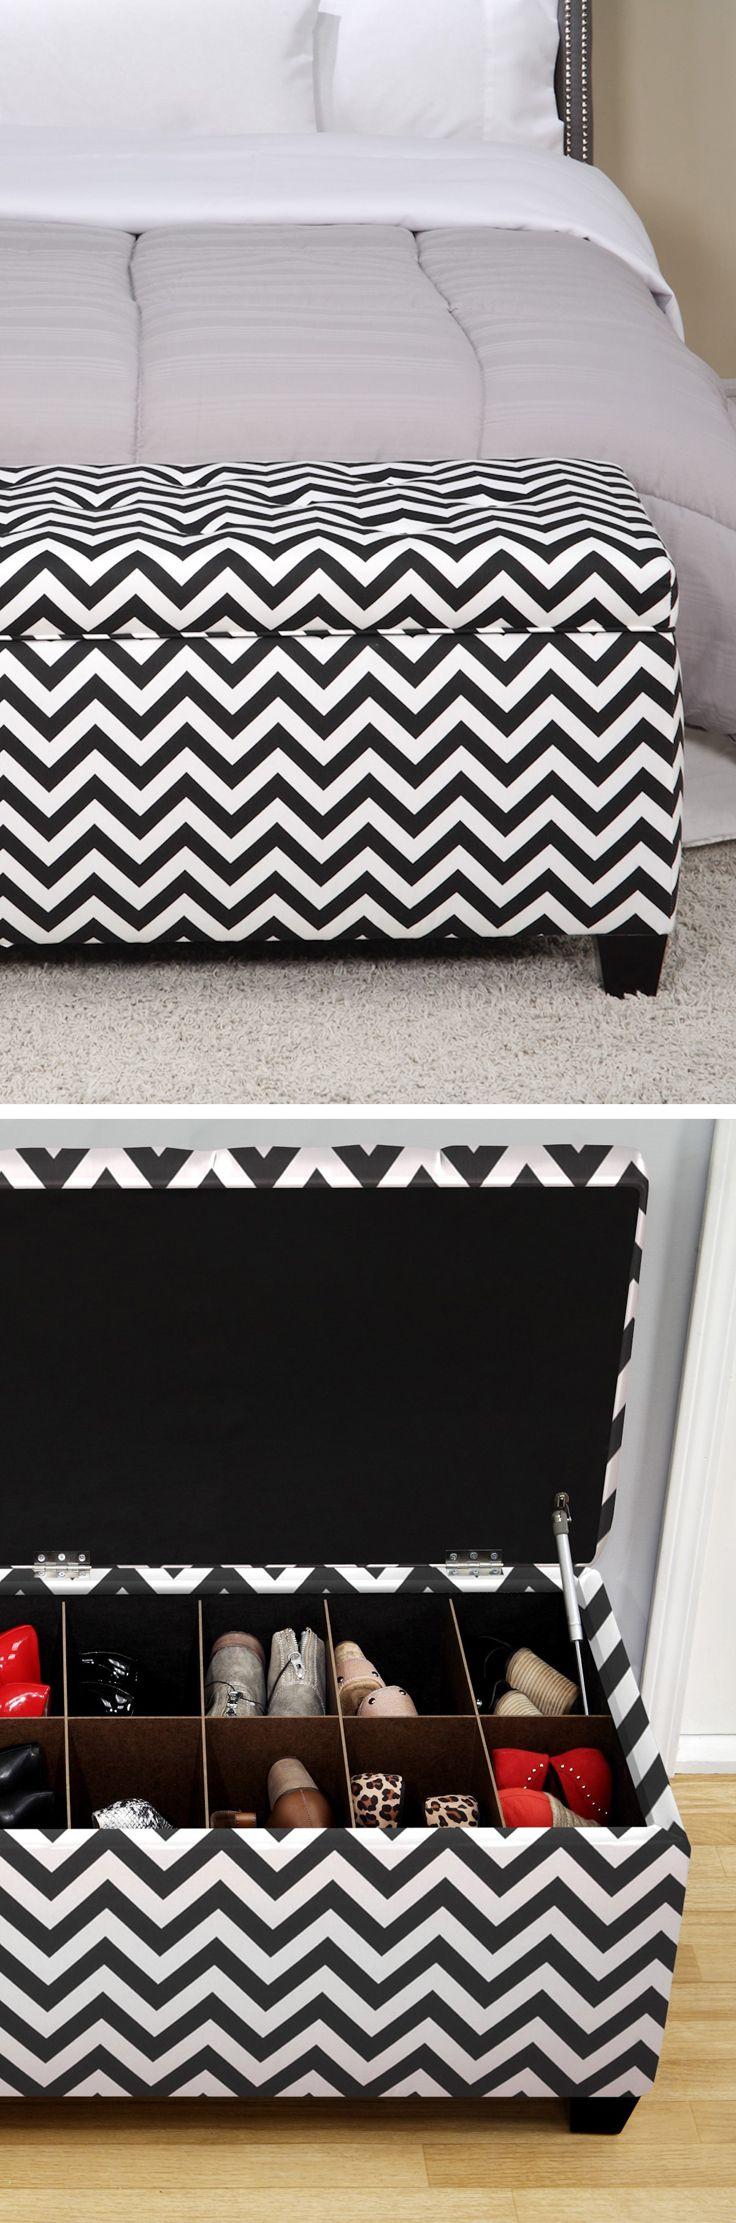 Chevron zig zag shoe storage ottoman bench // Perfect for bedroom or hall organization.